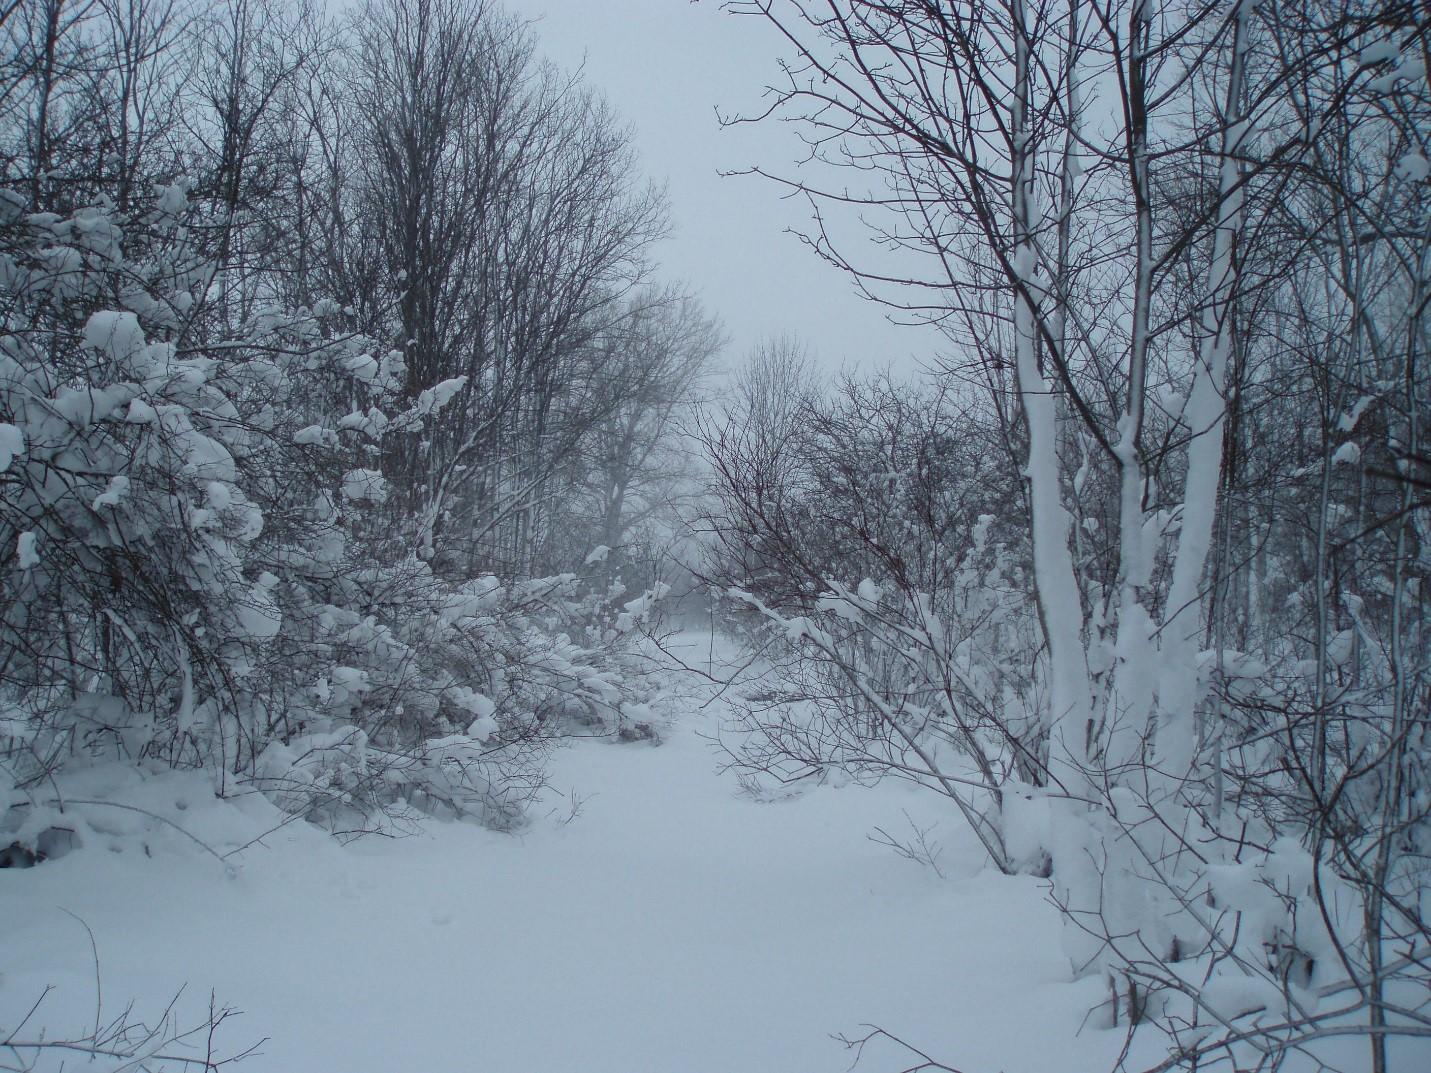 SnowyScene